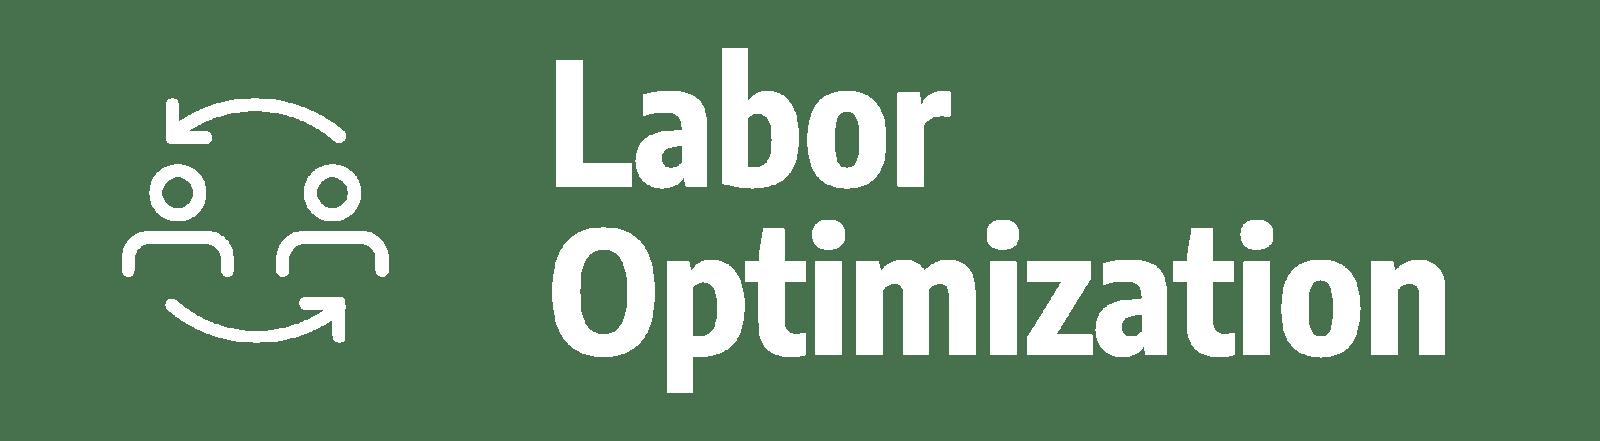 CognitOps | Labour Optimization